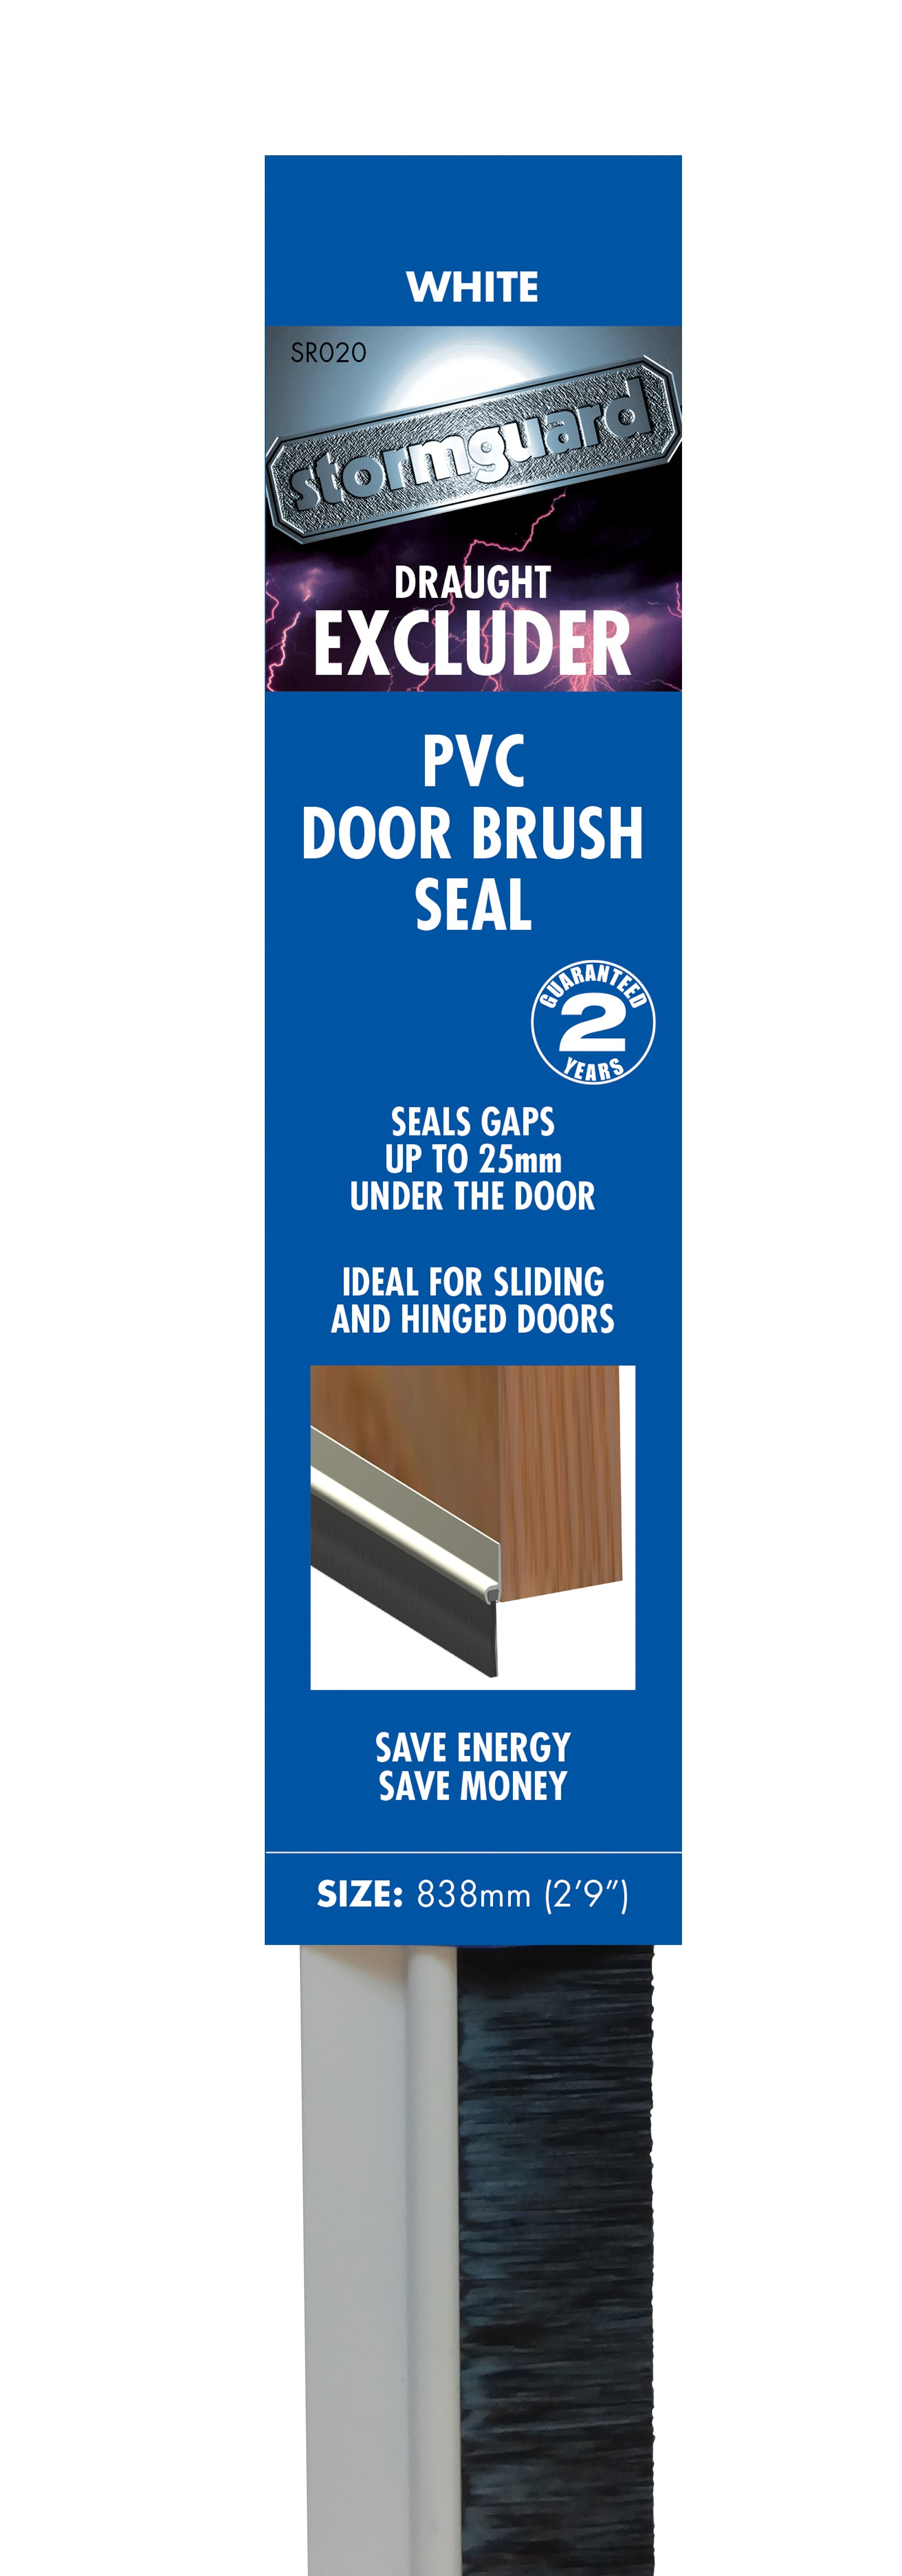 Pvc Brush Bottom Door Seal Stormguard